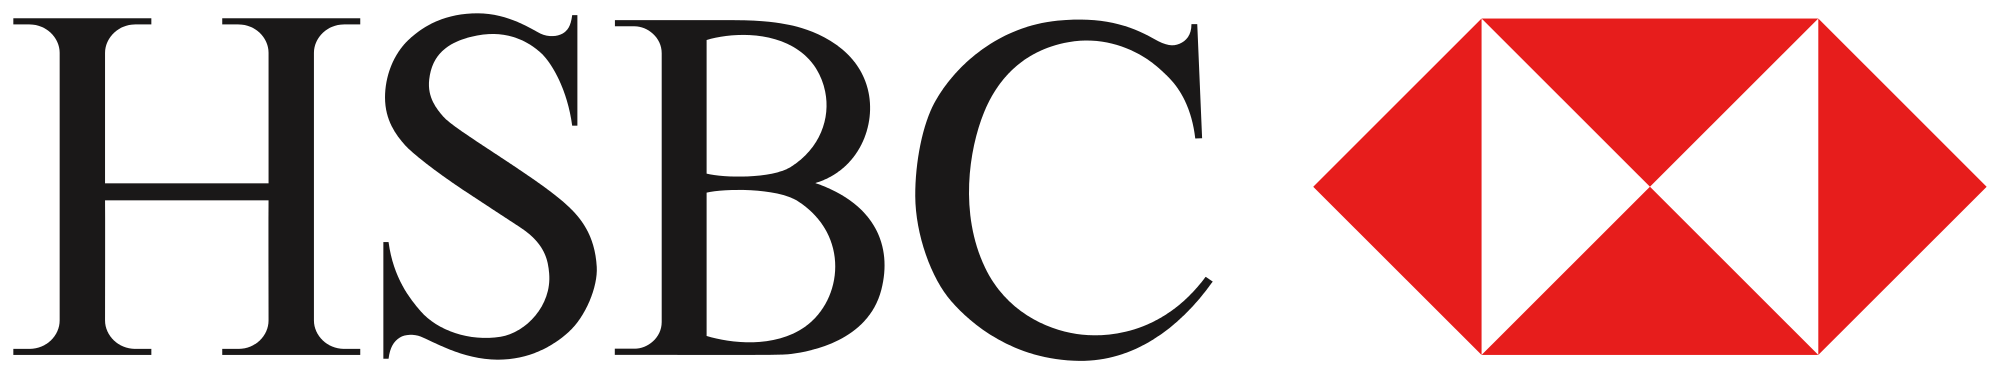 HSBC Logo 1